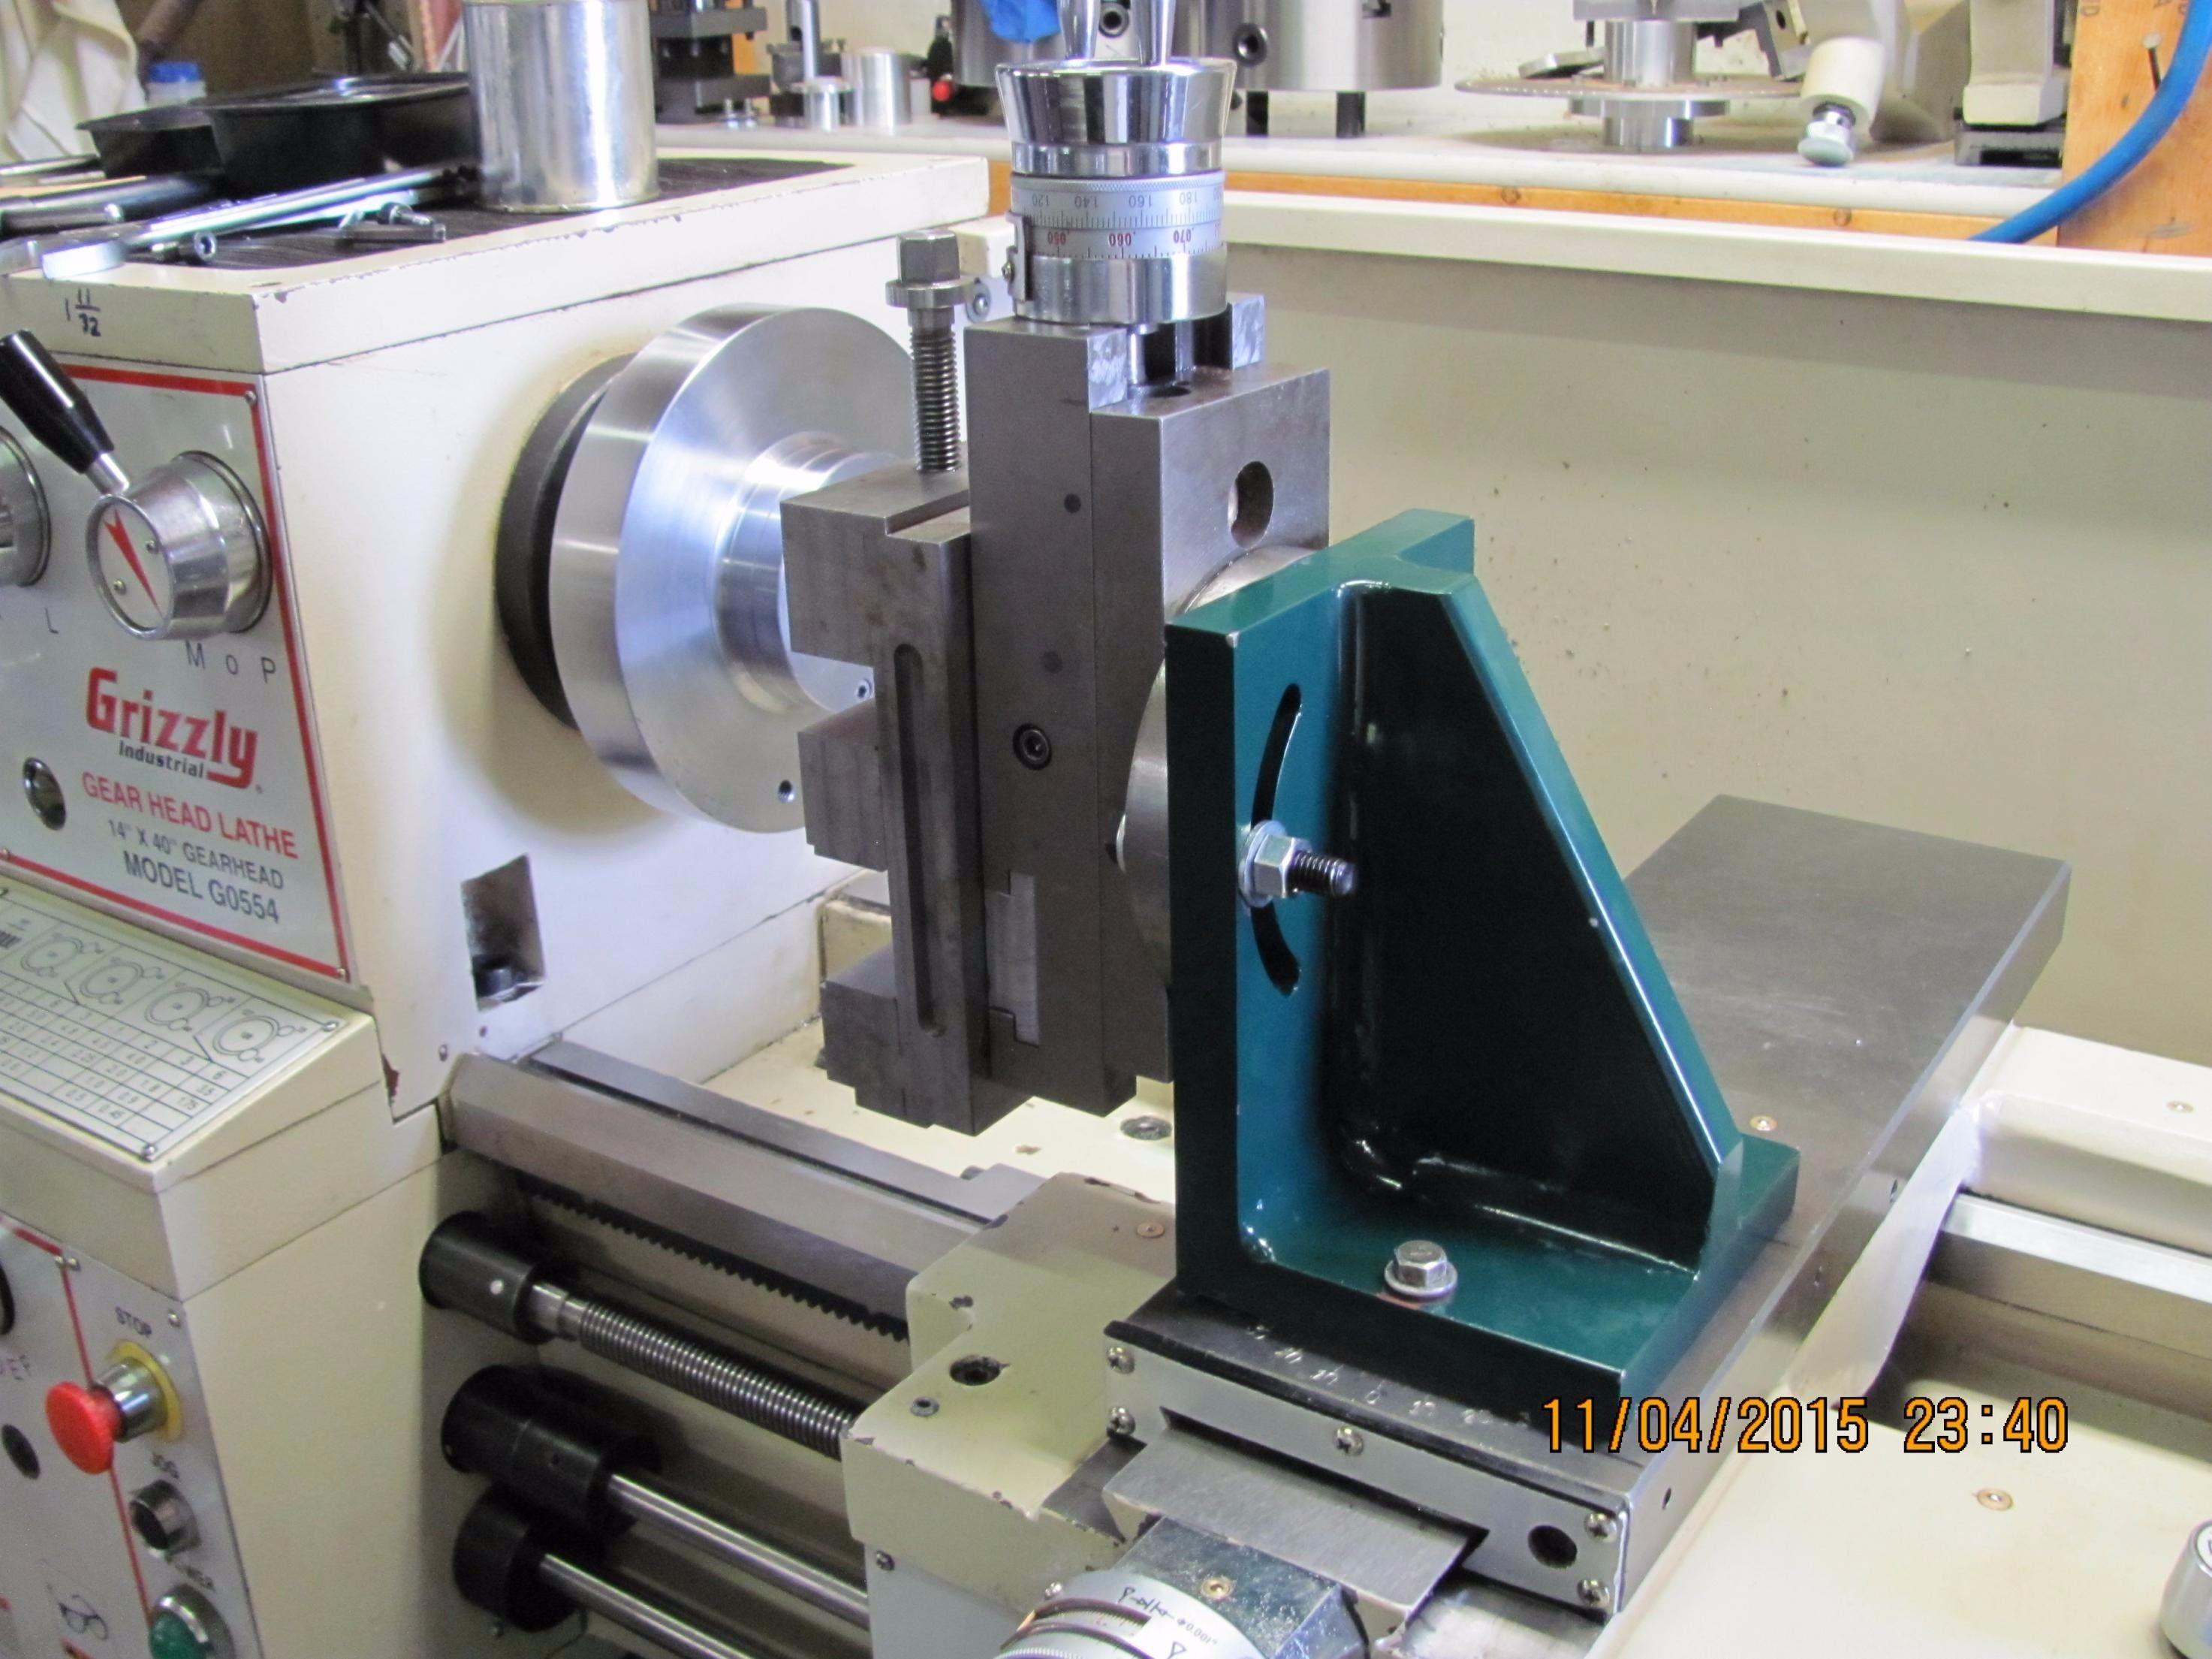 how to build a homemade metal lathe